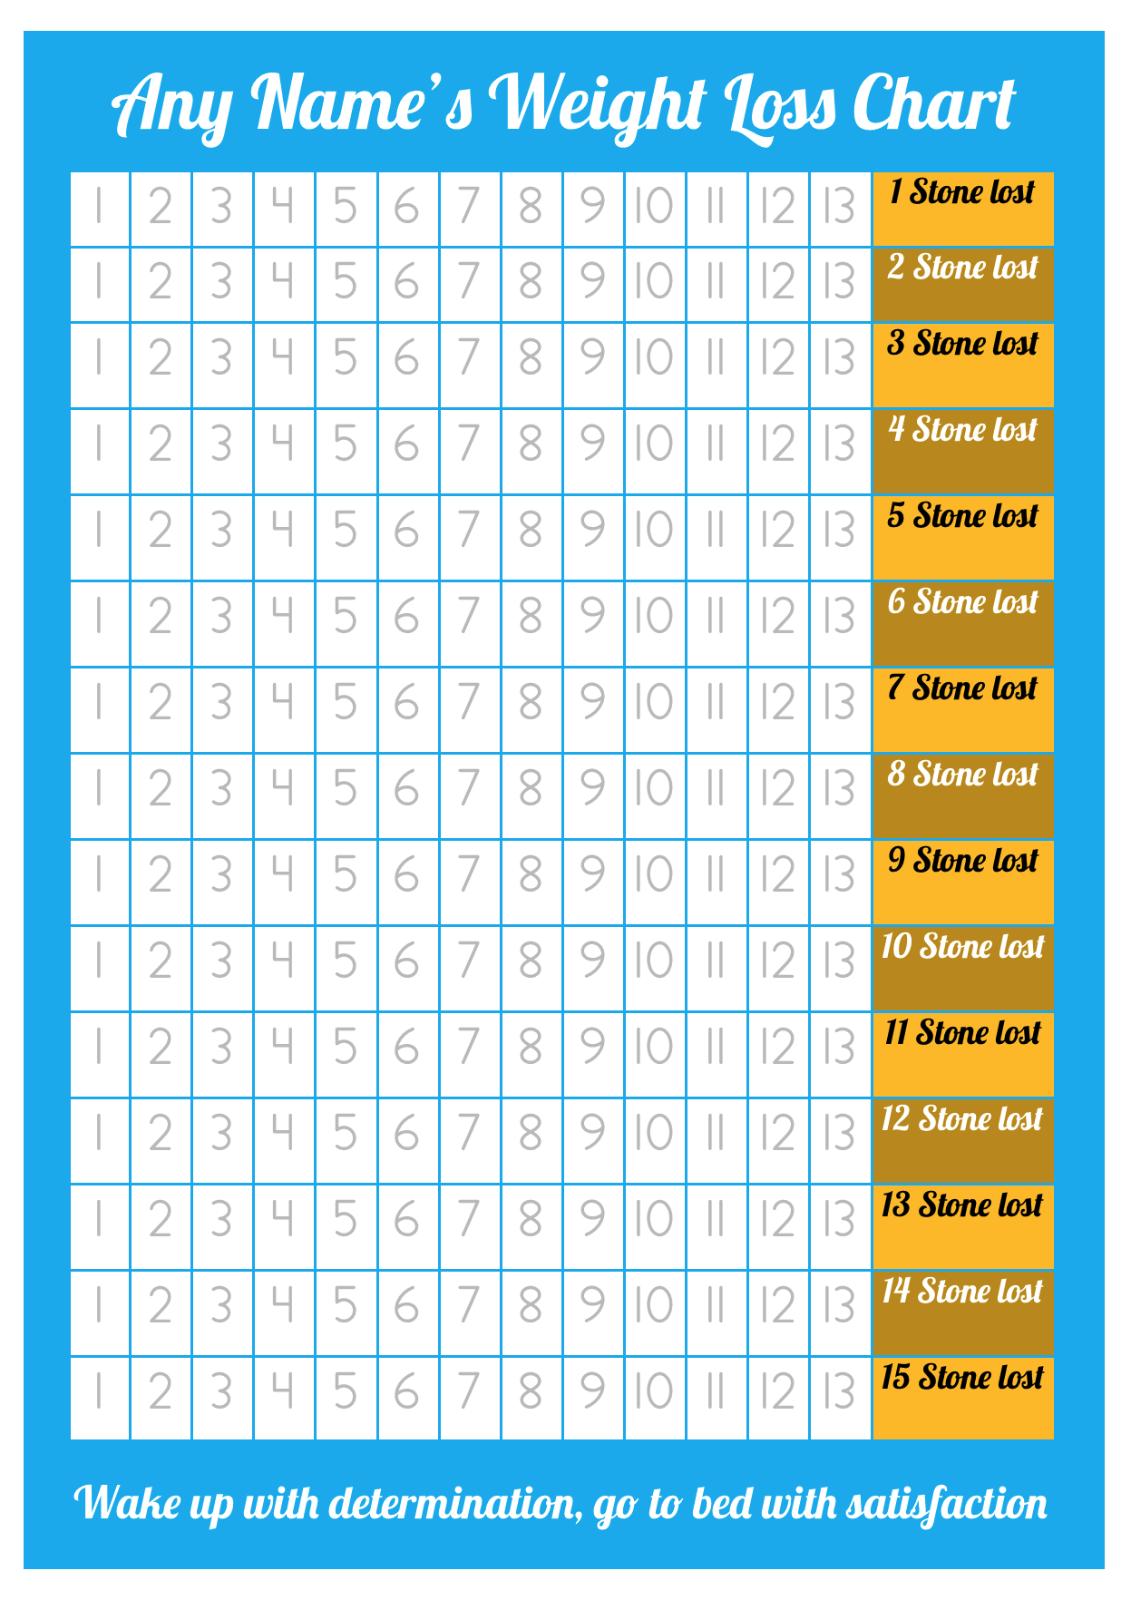 Stones weight chart choice image free any chart examples stones weight chart image collections free any chart examples stones weight chart gallery free any chart nvjuhfo Images